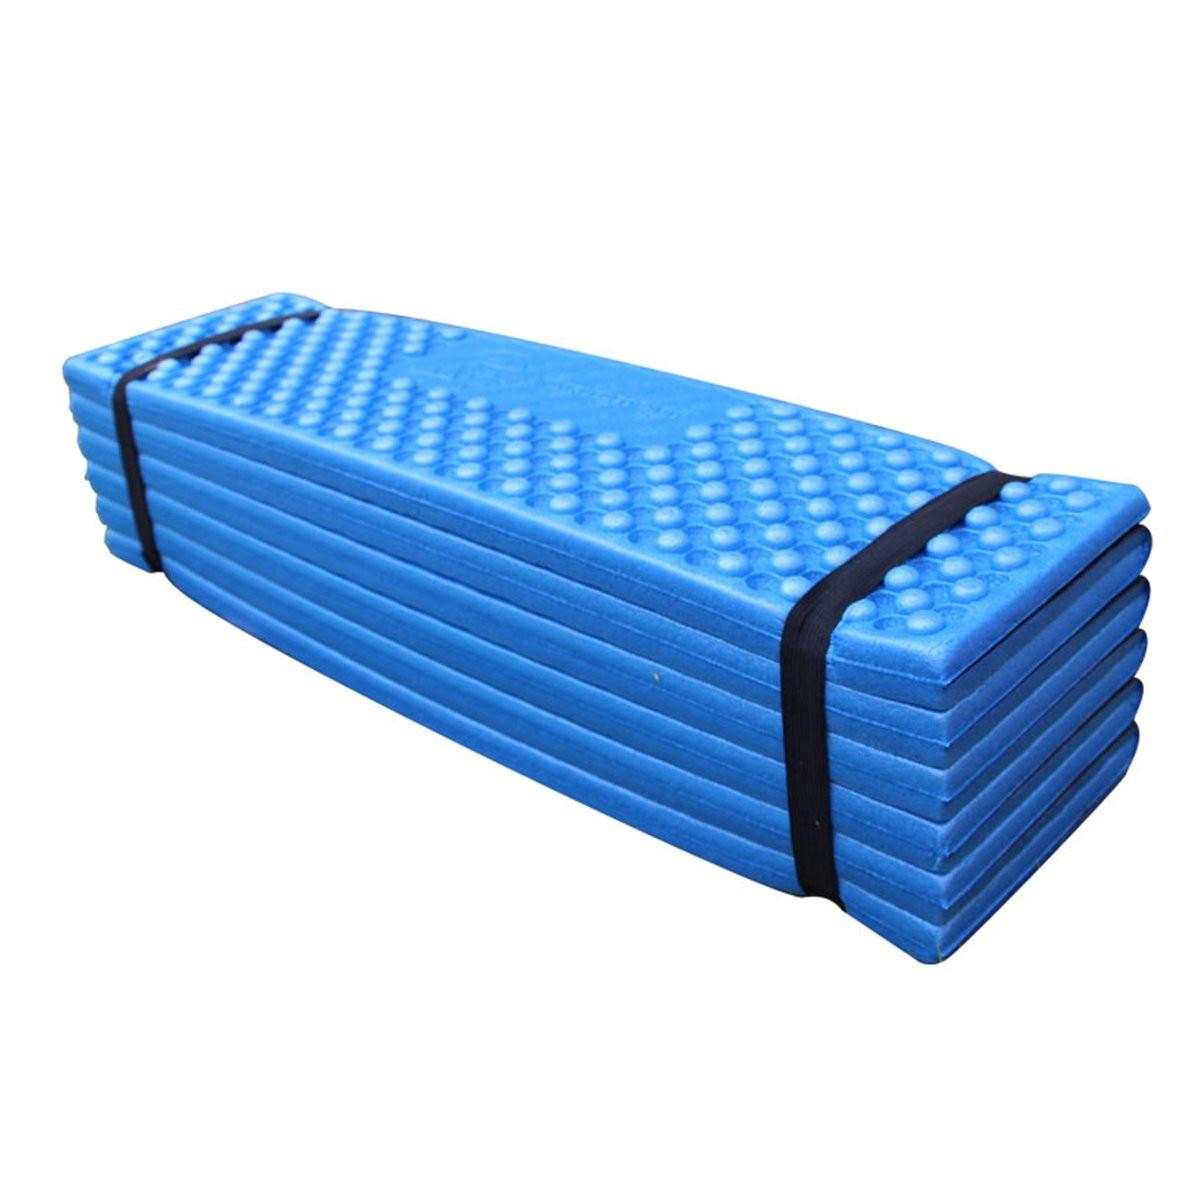 pad 190 Semoo self-inflating camping sleeping mat/pad, 190t polyester, water  repellent  koolsen camping sleeping pad self inflating with attached  pillow.